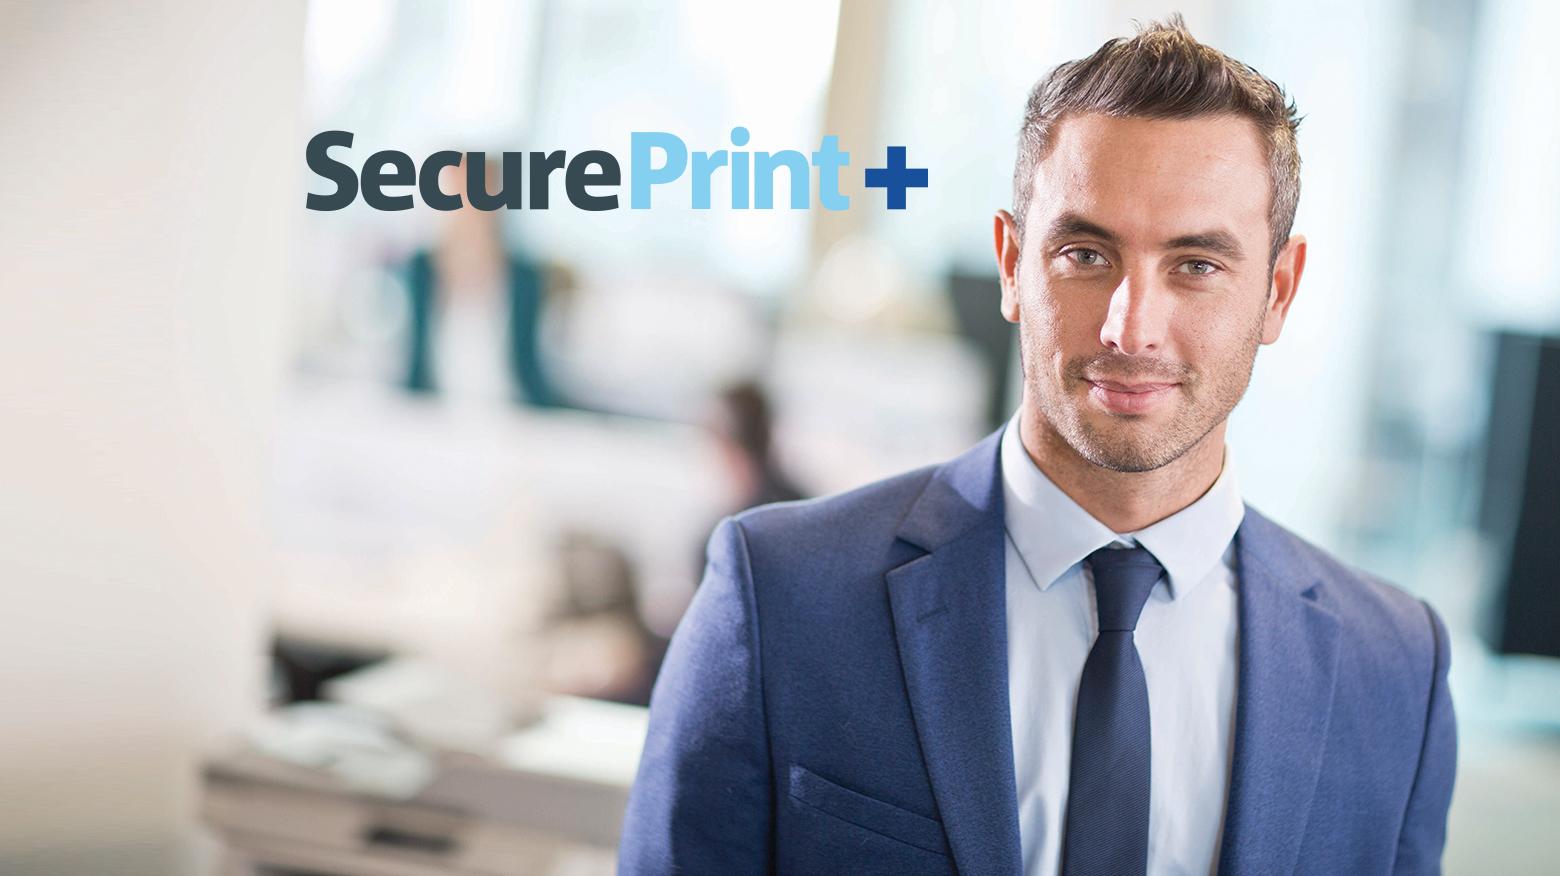 secureprint-plus